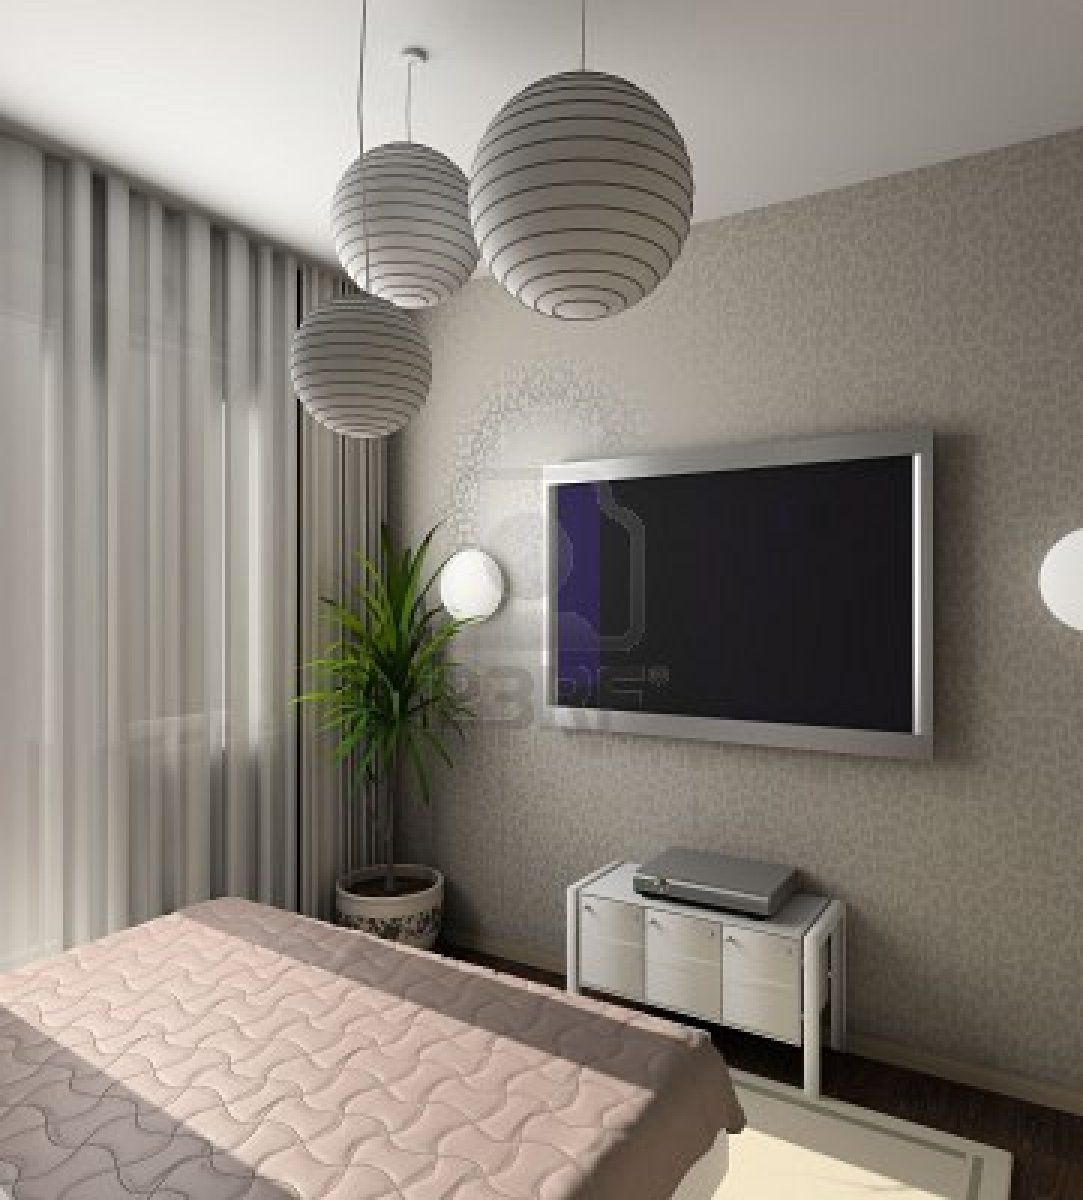 bedroom tv table design | design ideas 2017-2018 | pinterest